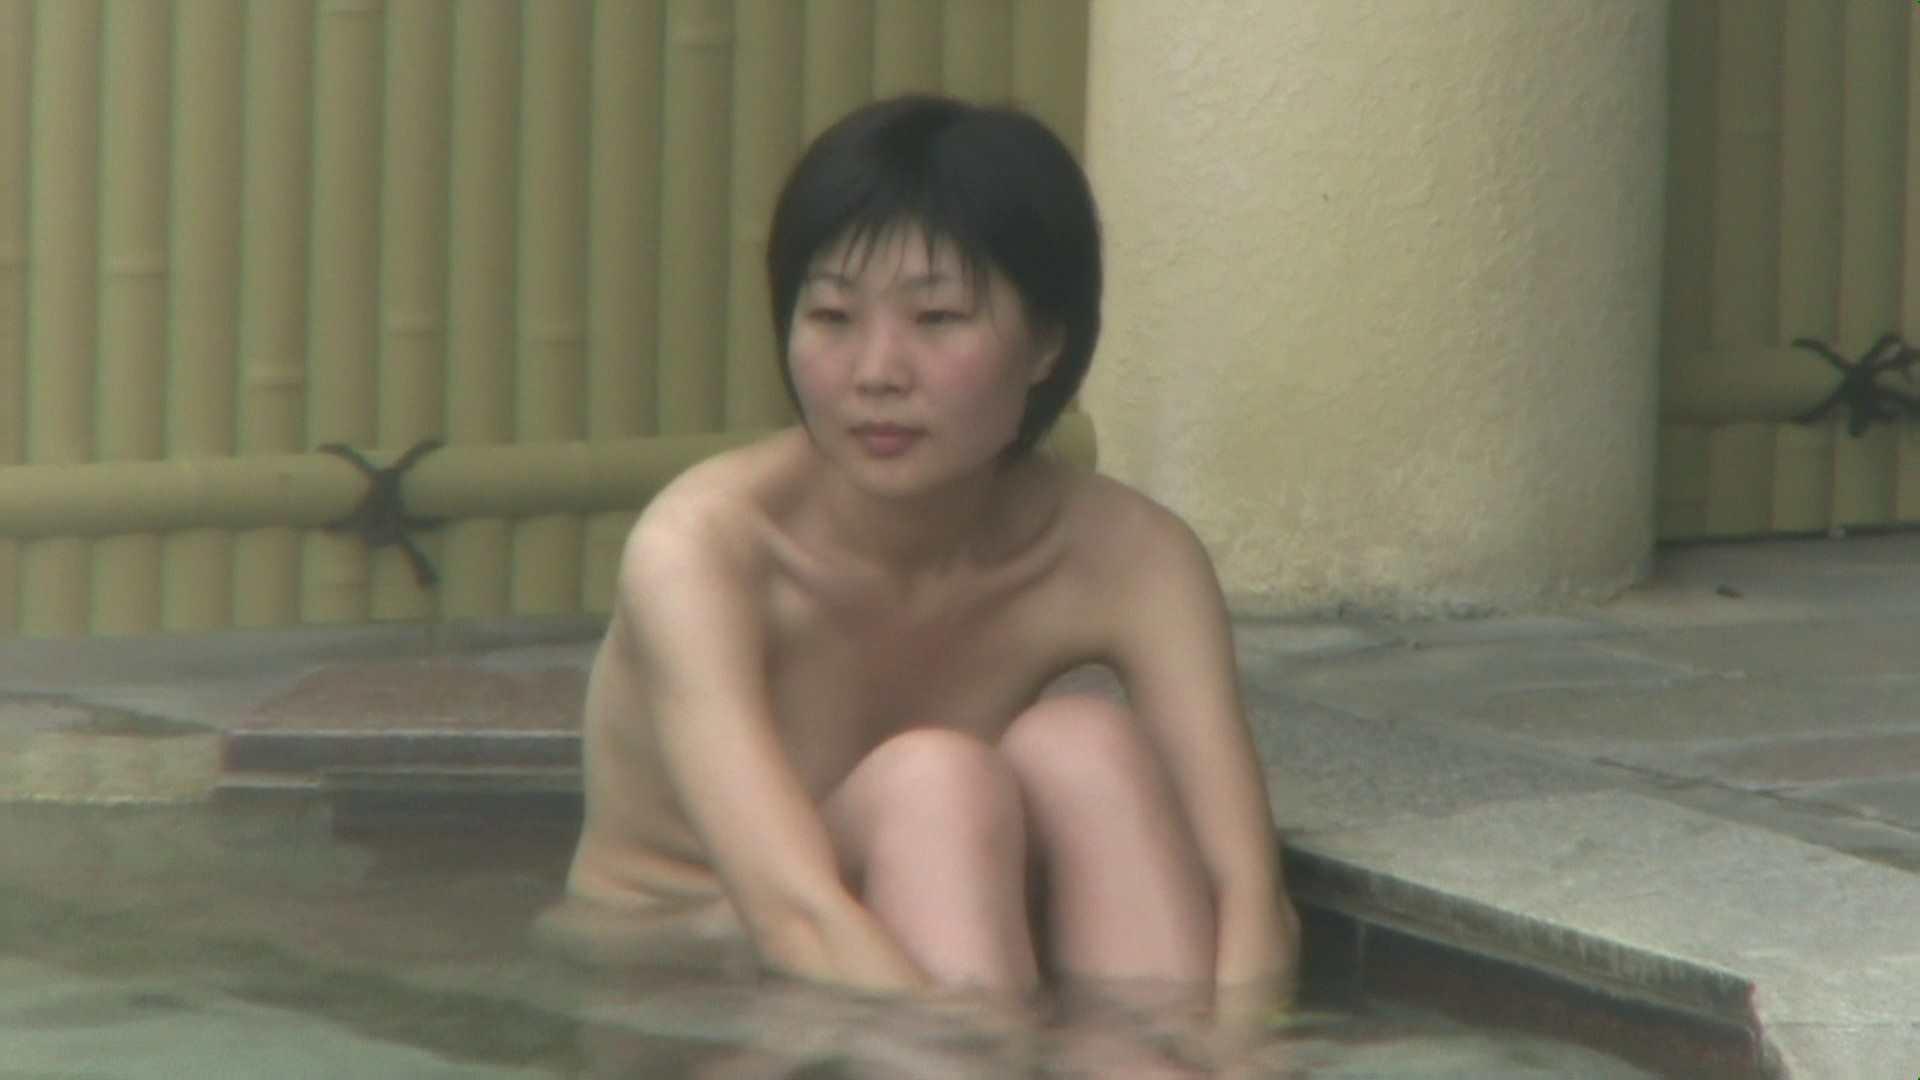 Aquaな露天風呂Vol.75【VIP限定】 露天風呂編 | 盗撮シリーズ  99PIX 79